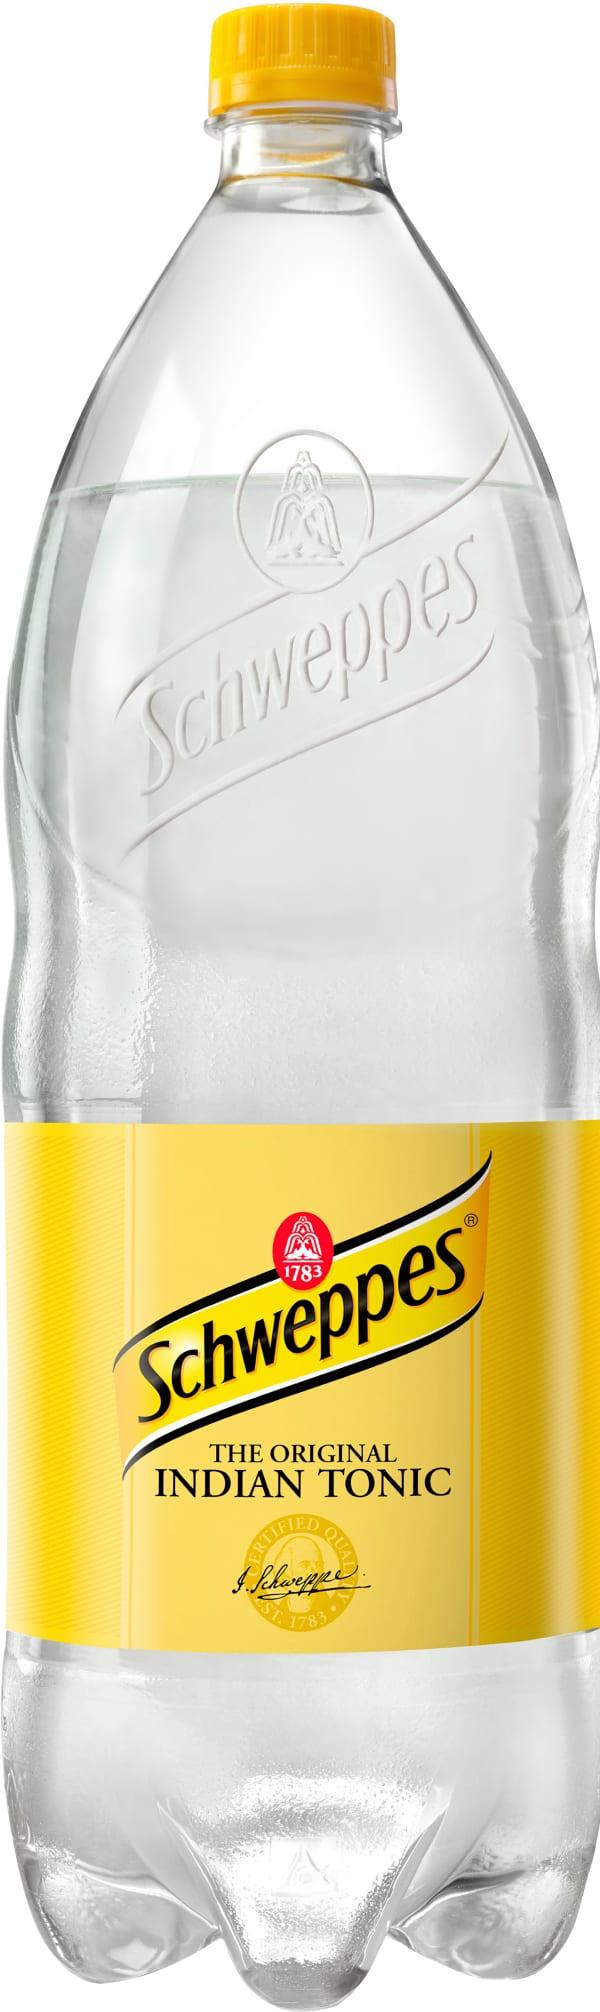 Schweppes Indian Tonic Water plastflaska